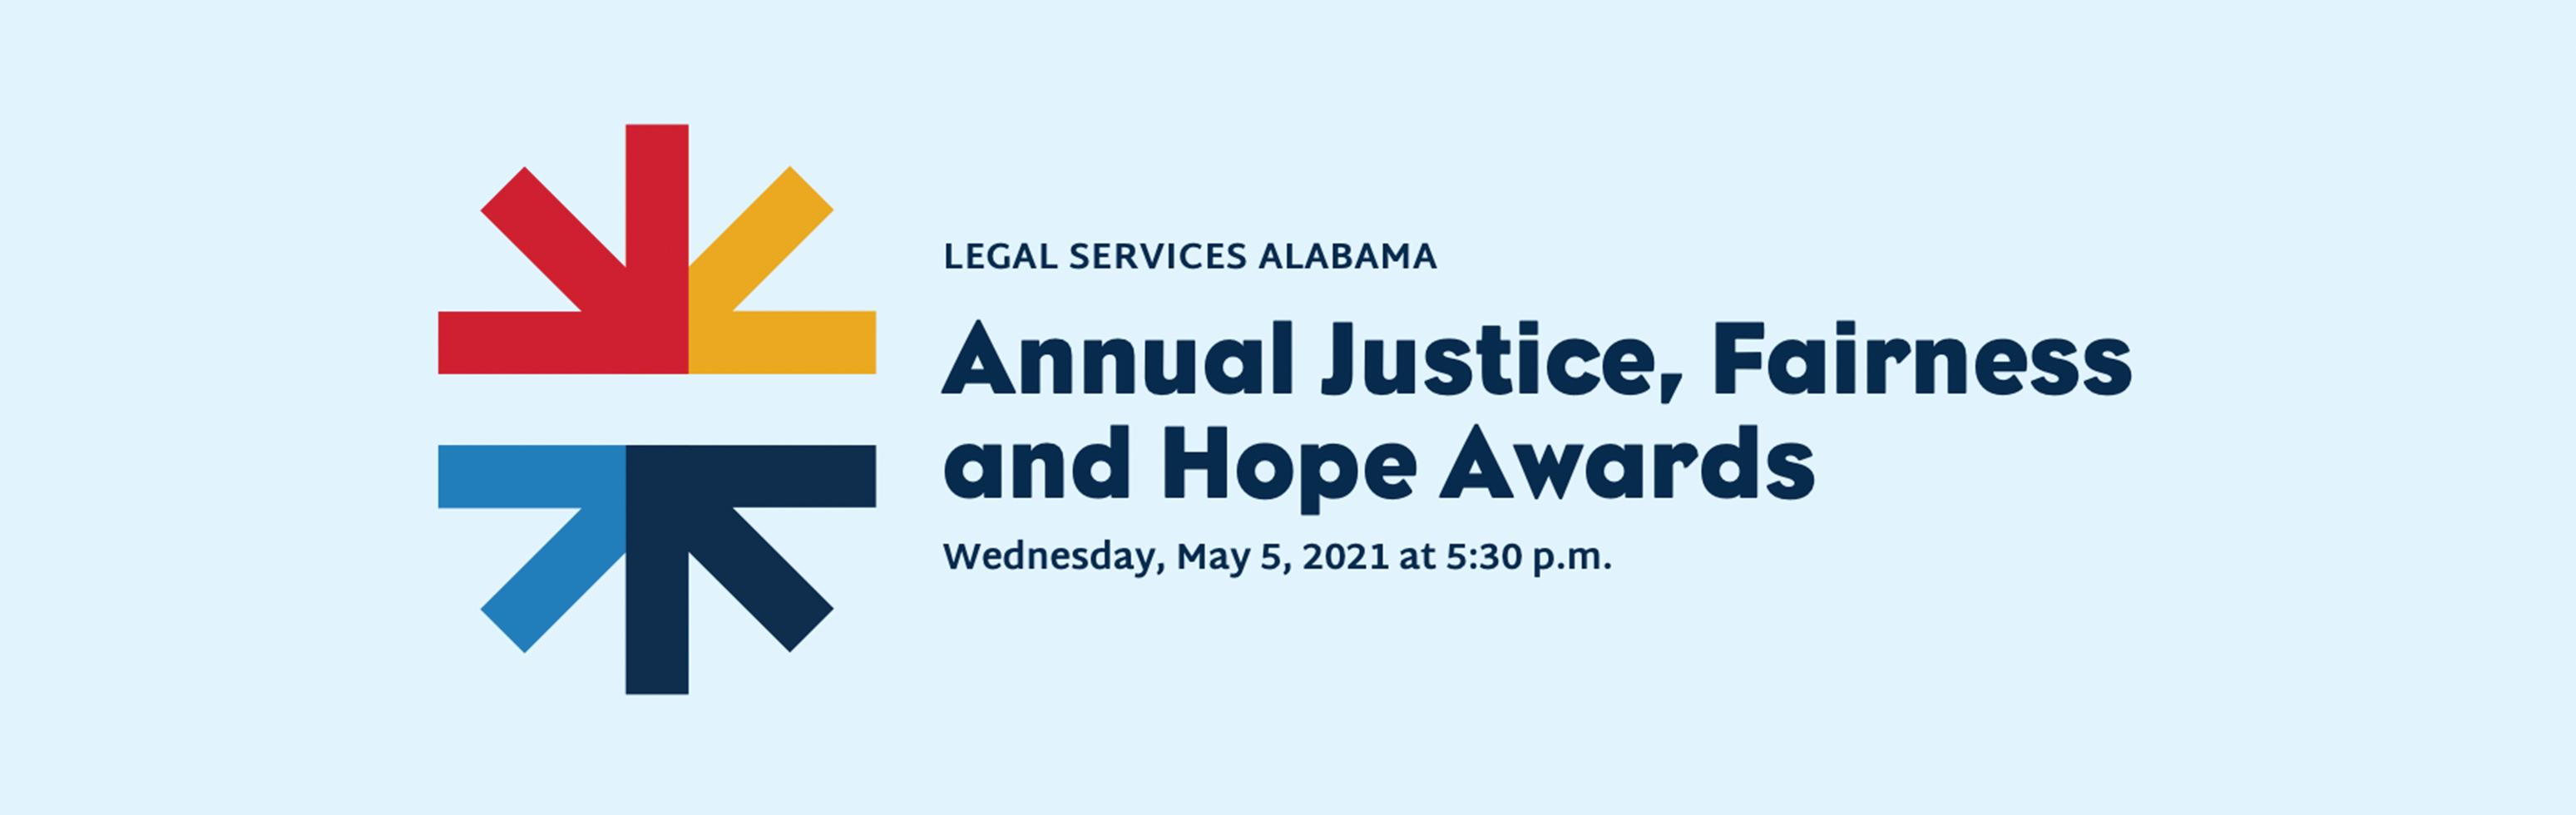 Legal Services Alabama